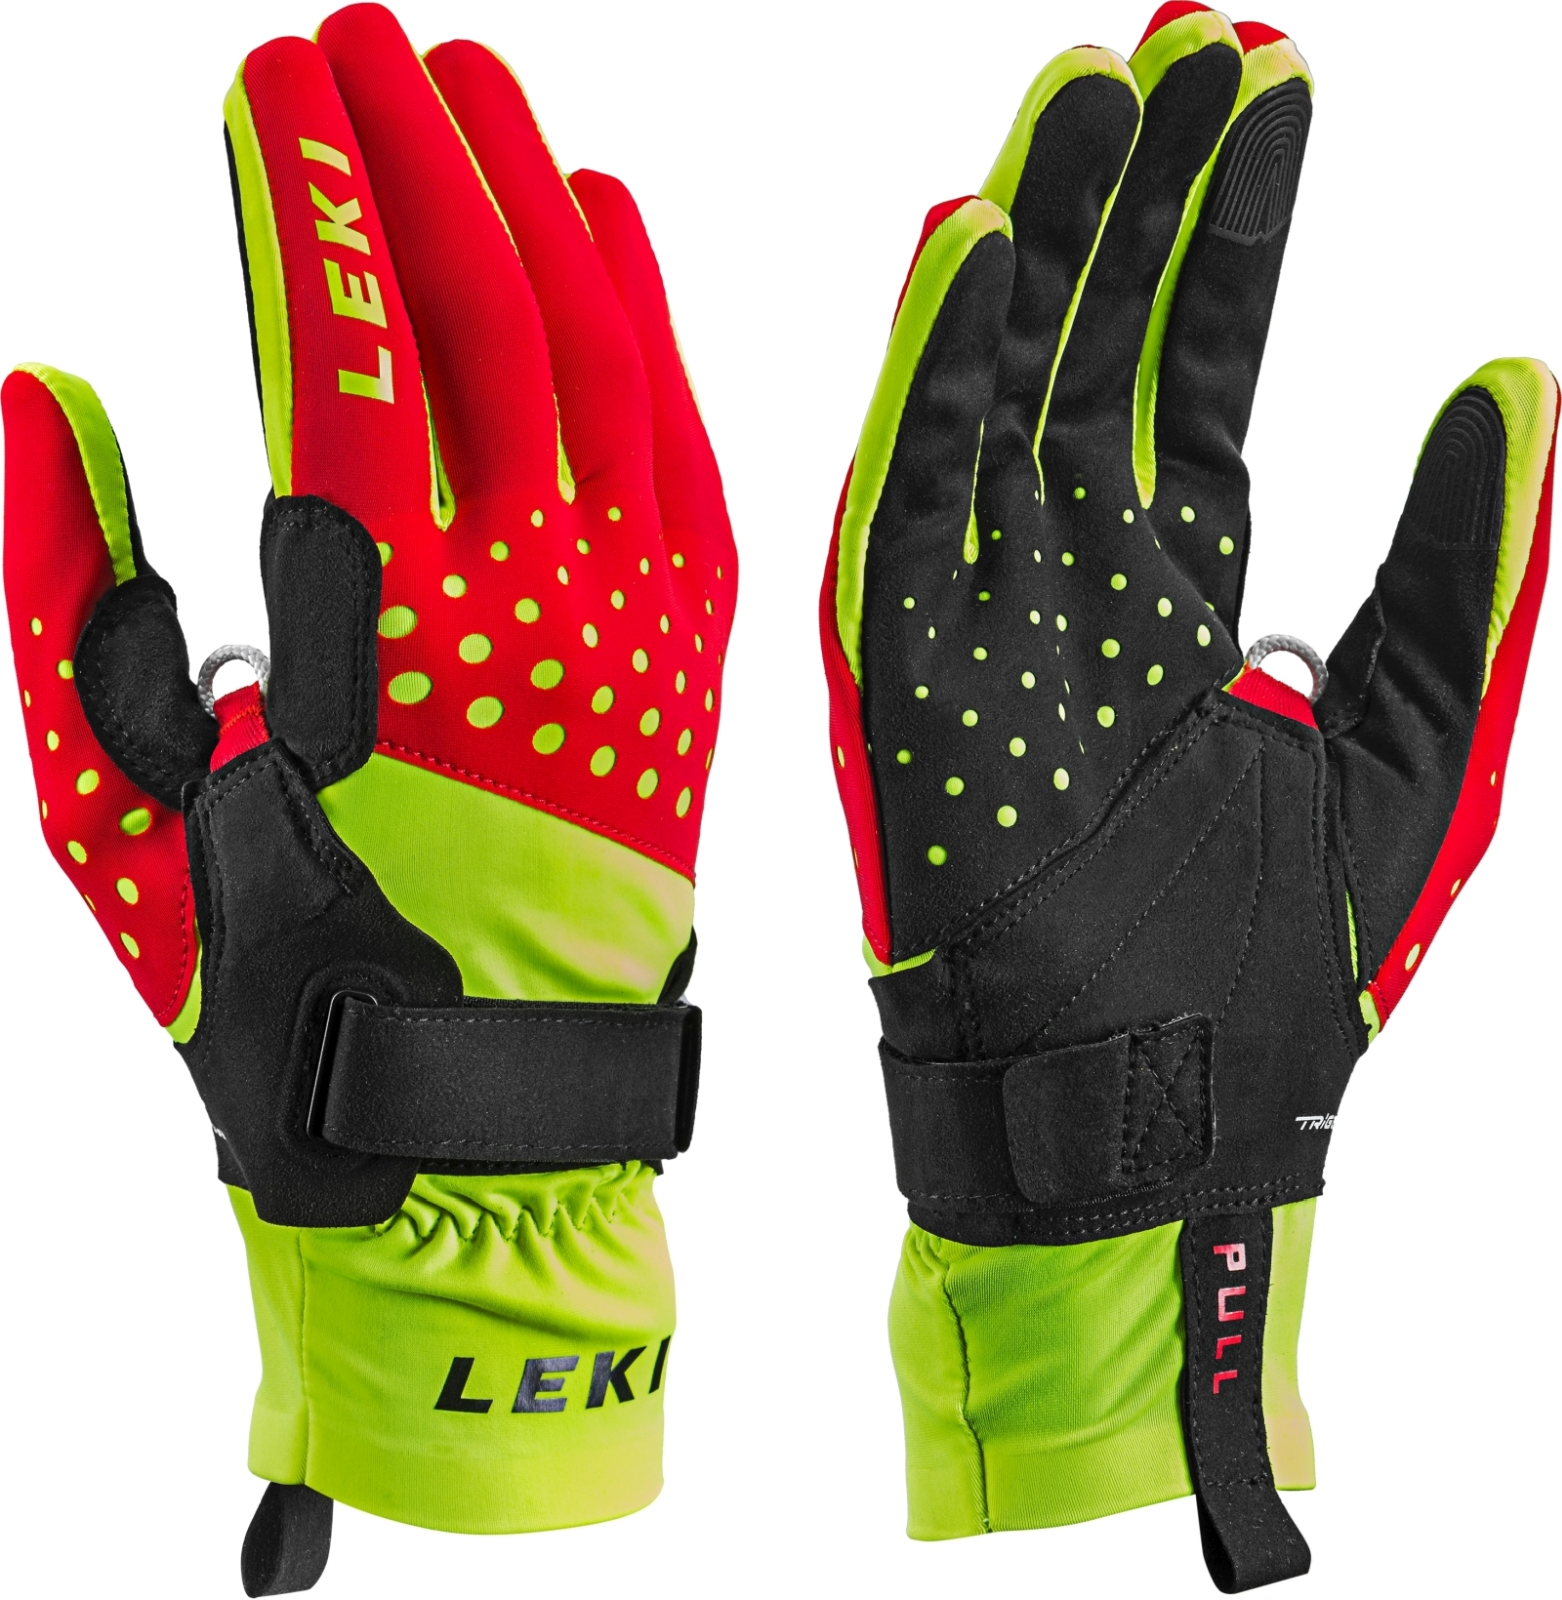 a1a325f5d95 Běžkařské rukavice Leki Nordic Race Shark red-yellow-black - Ski a ...